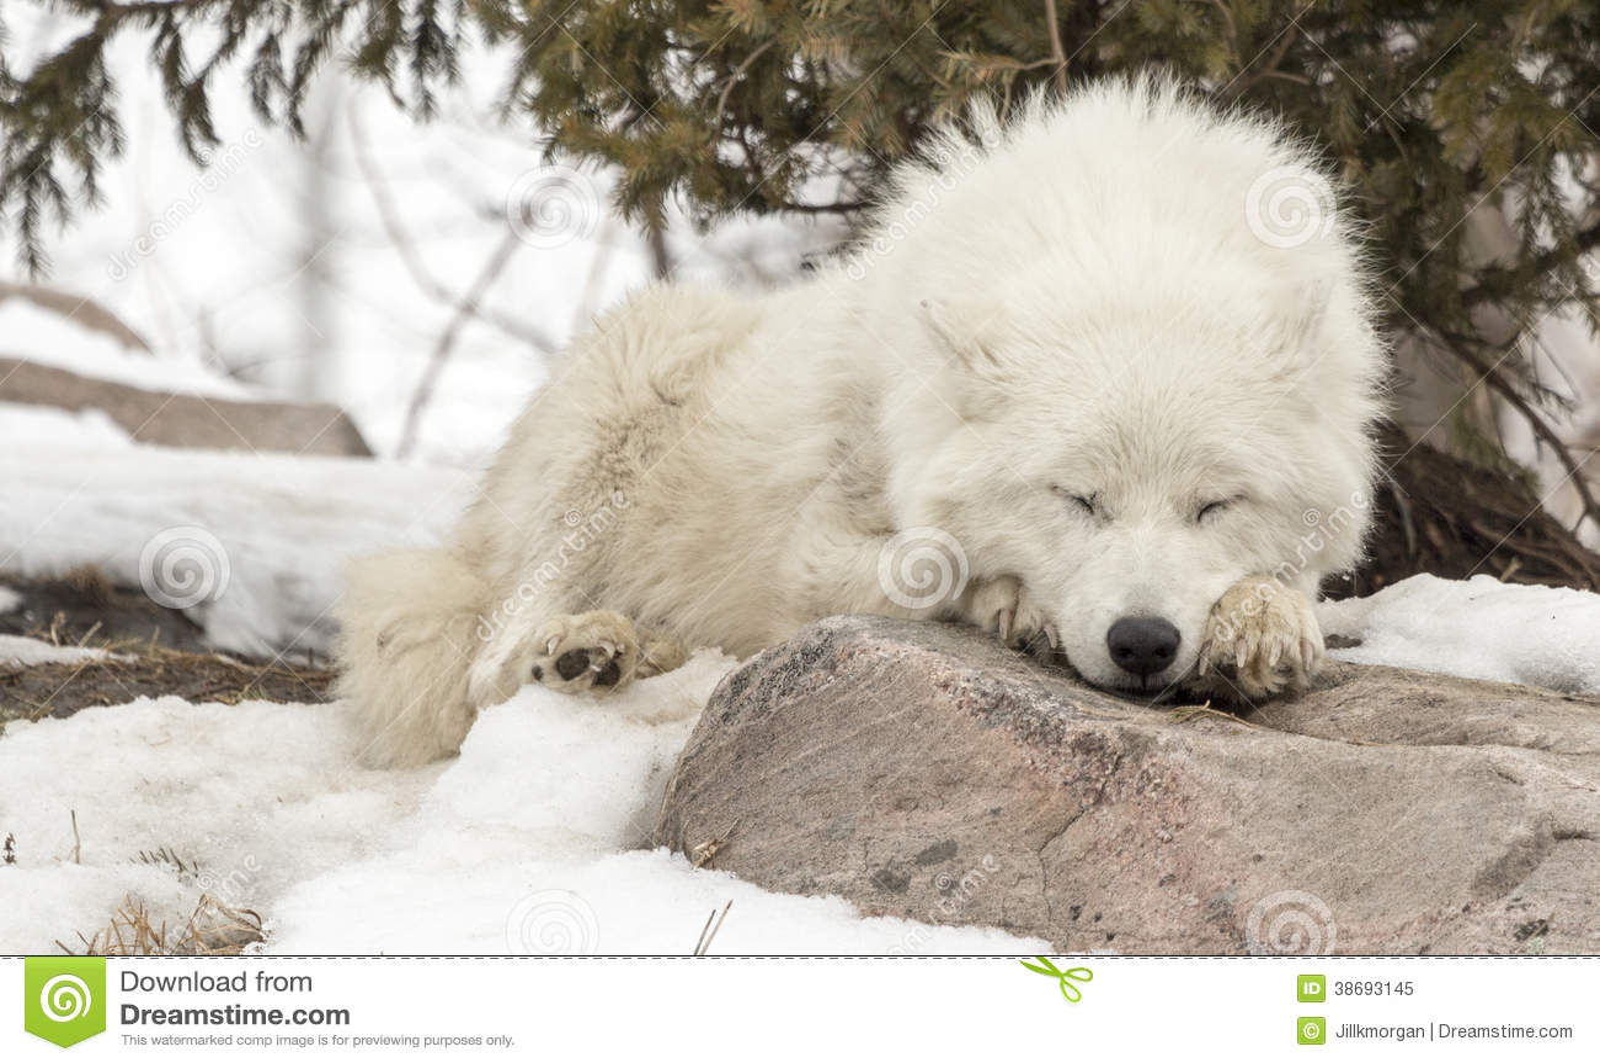 Arctic wolf in snow - photo#27